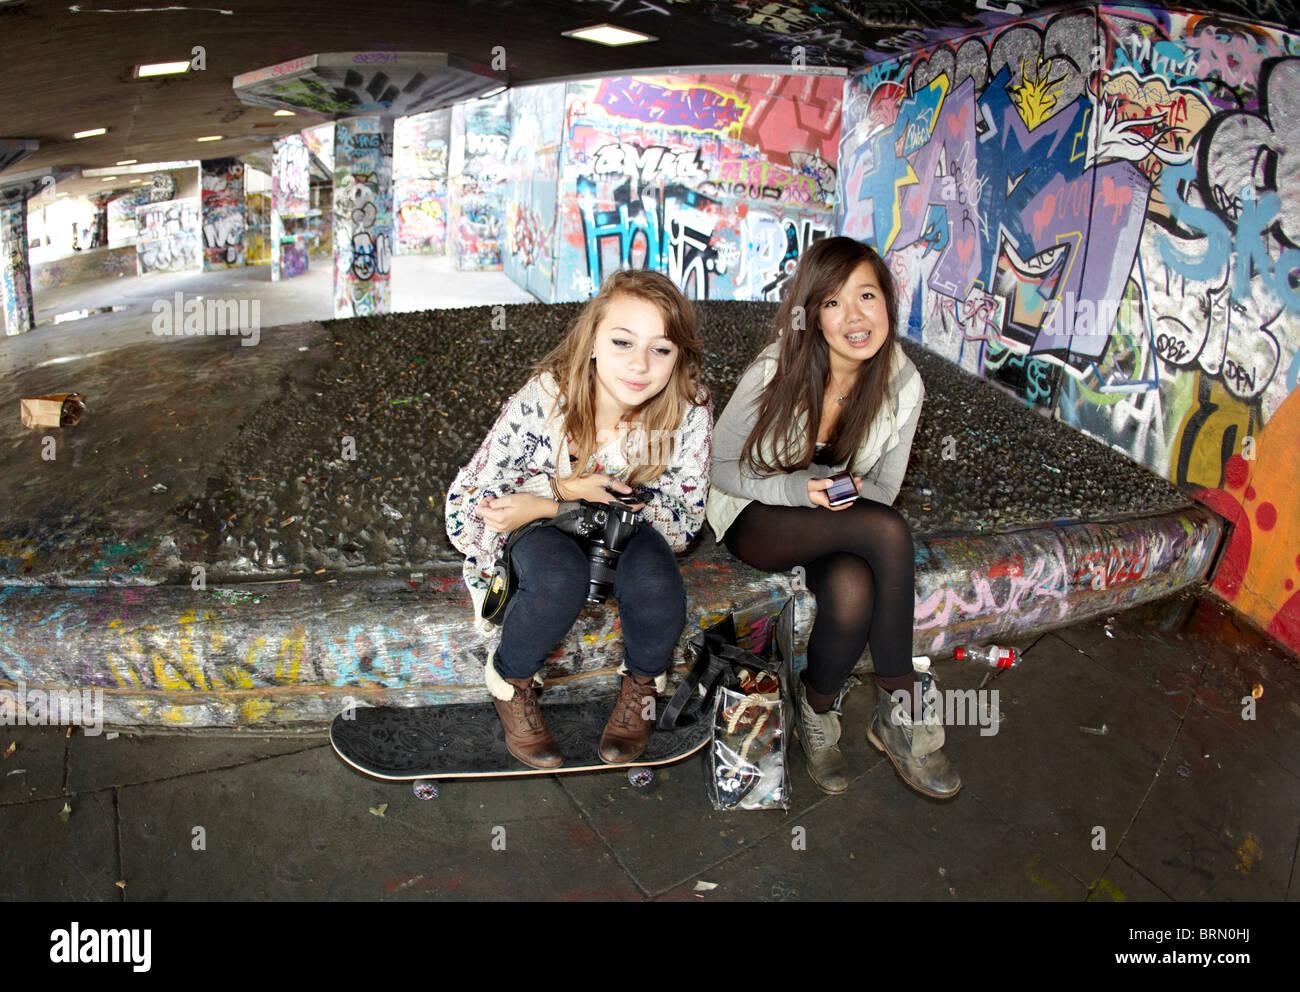 South London Mädchen